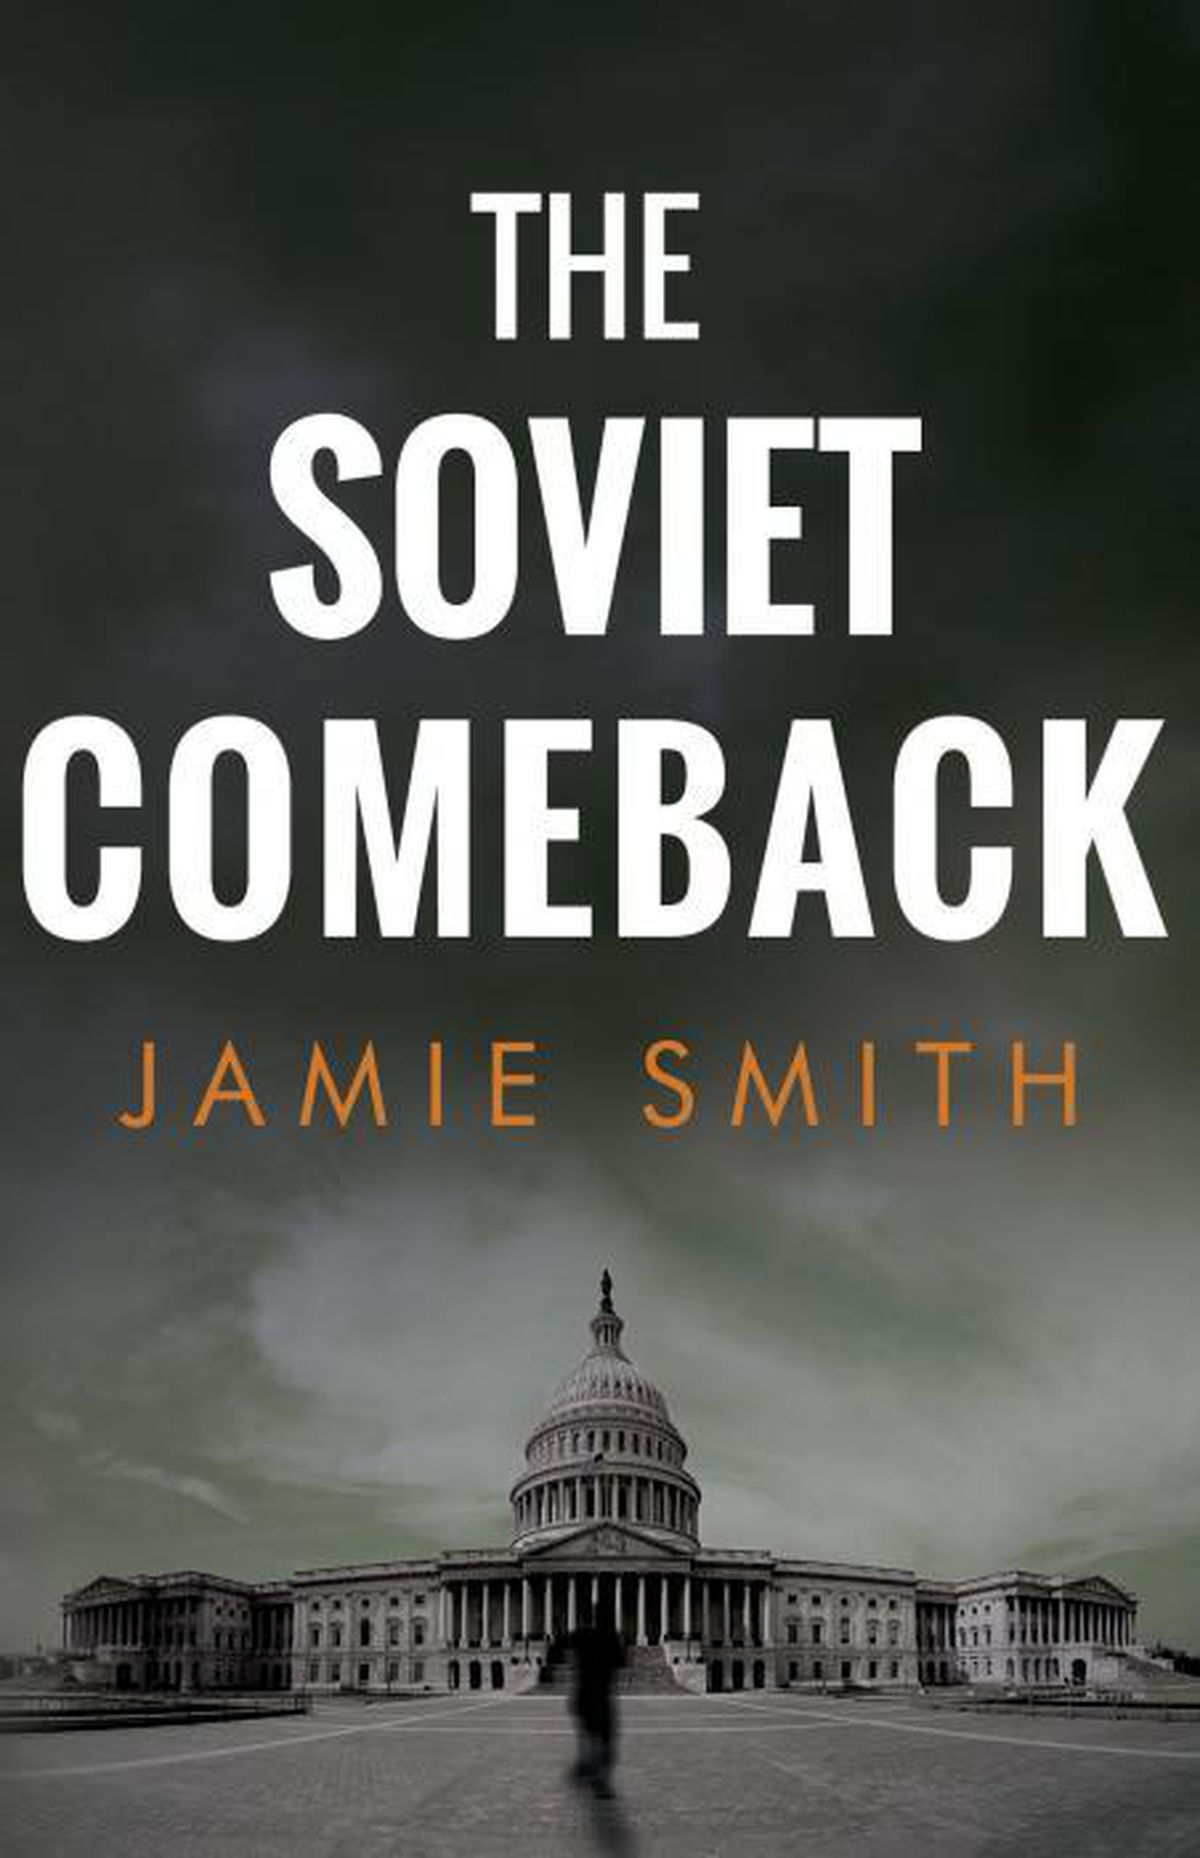 The Soviet Comeback